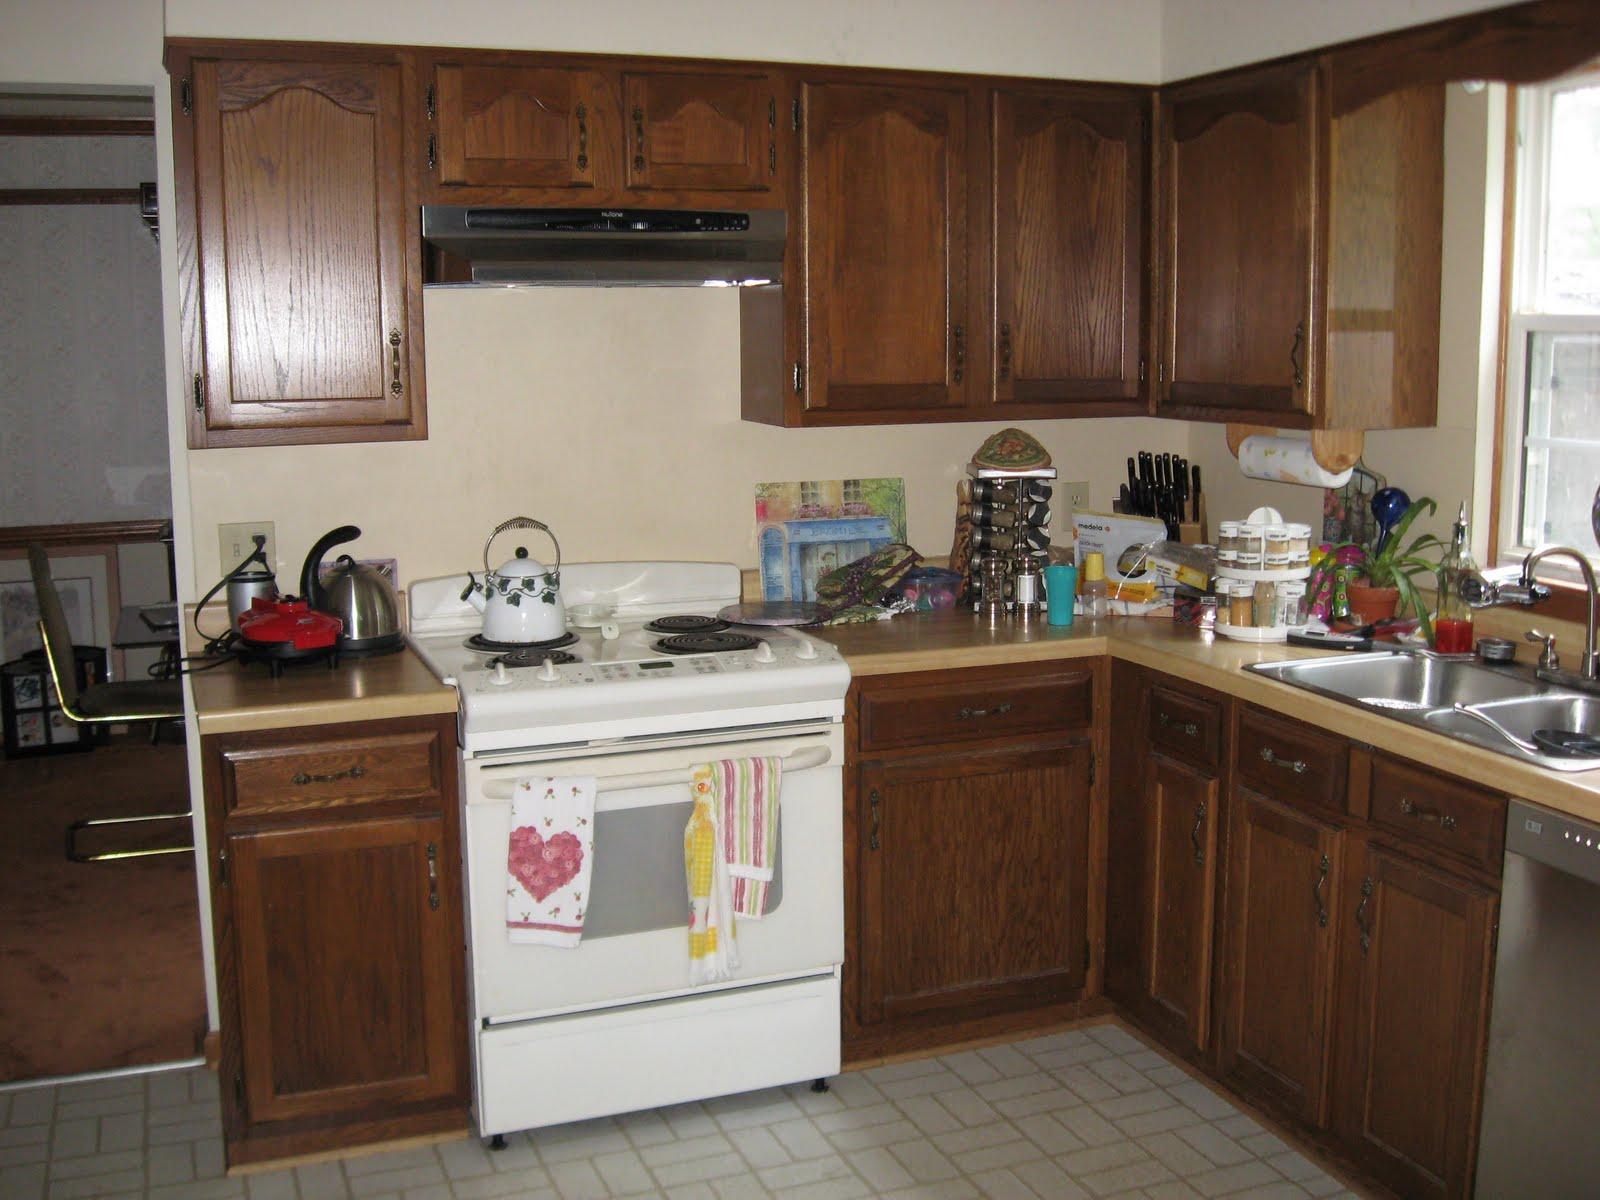 shiny happy kitchen kitchen craft cabinets I Think Therefore I Craft